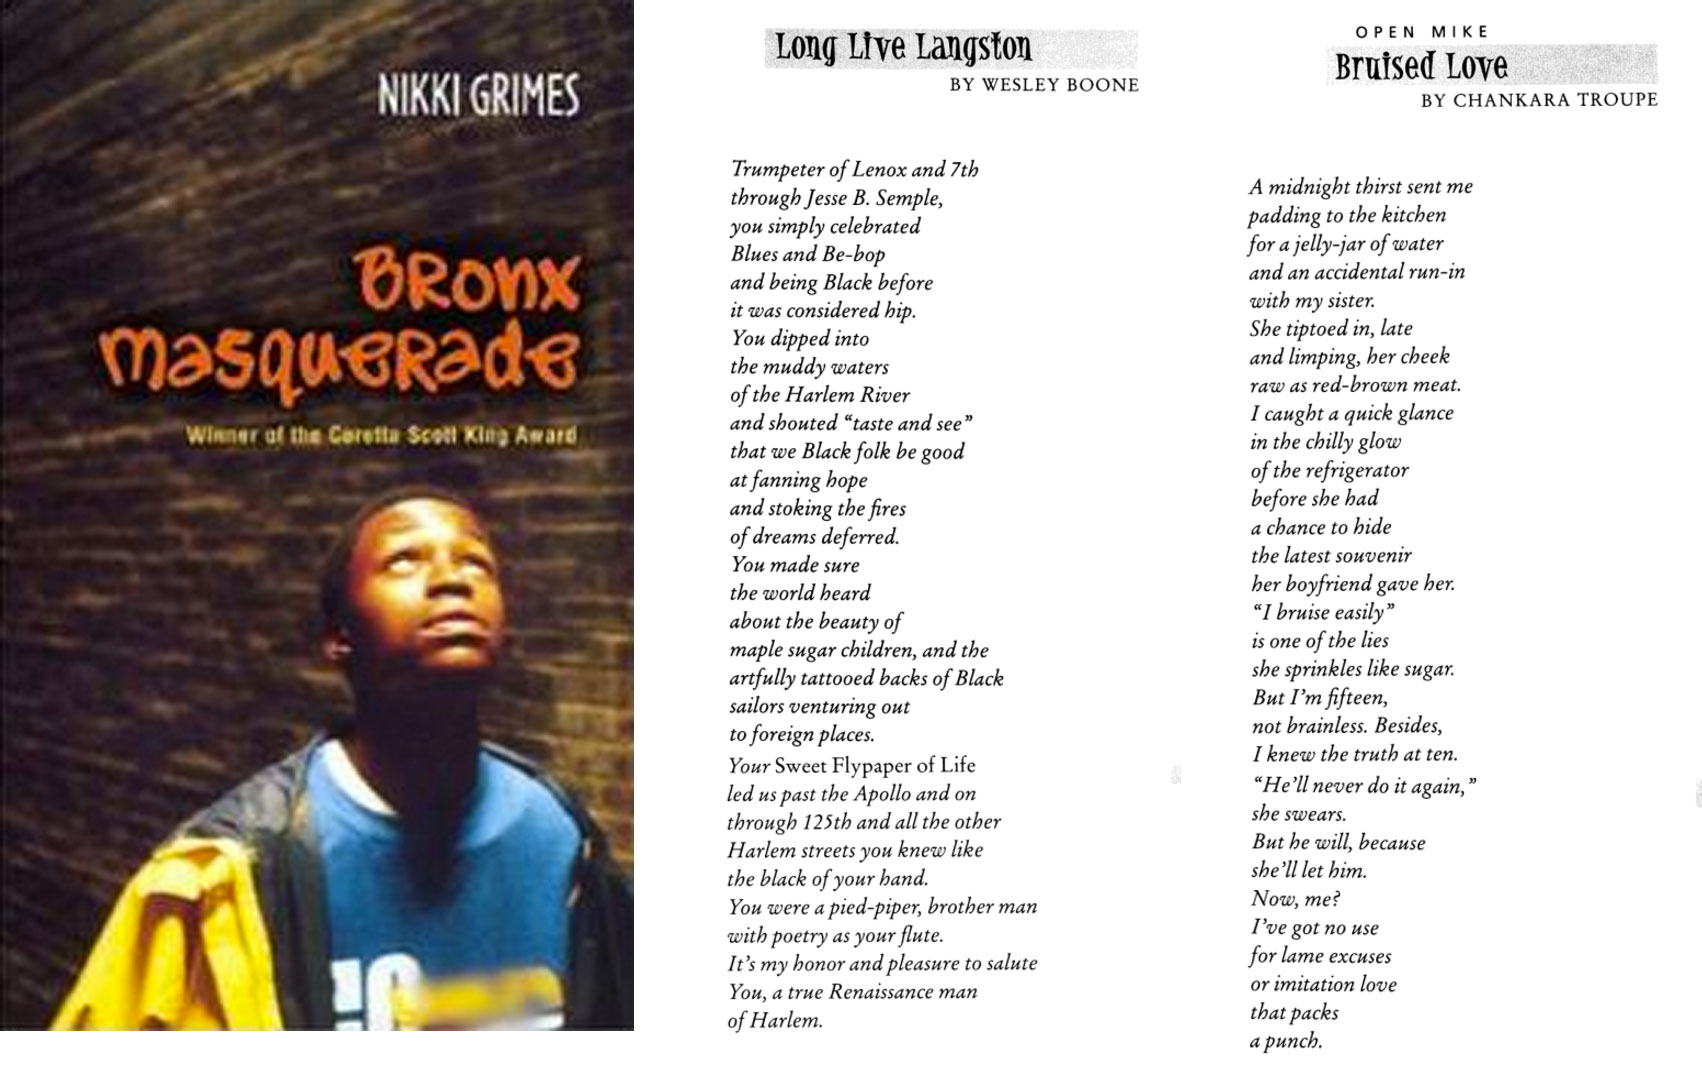 Bronx masquerade by nikki grimes this